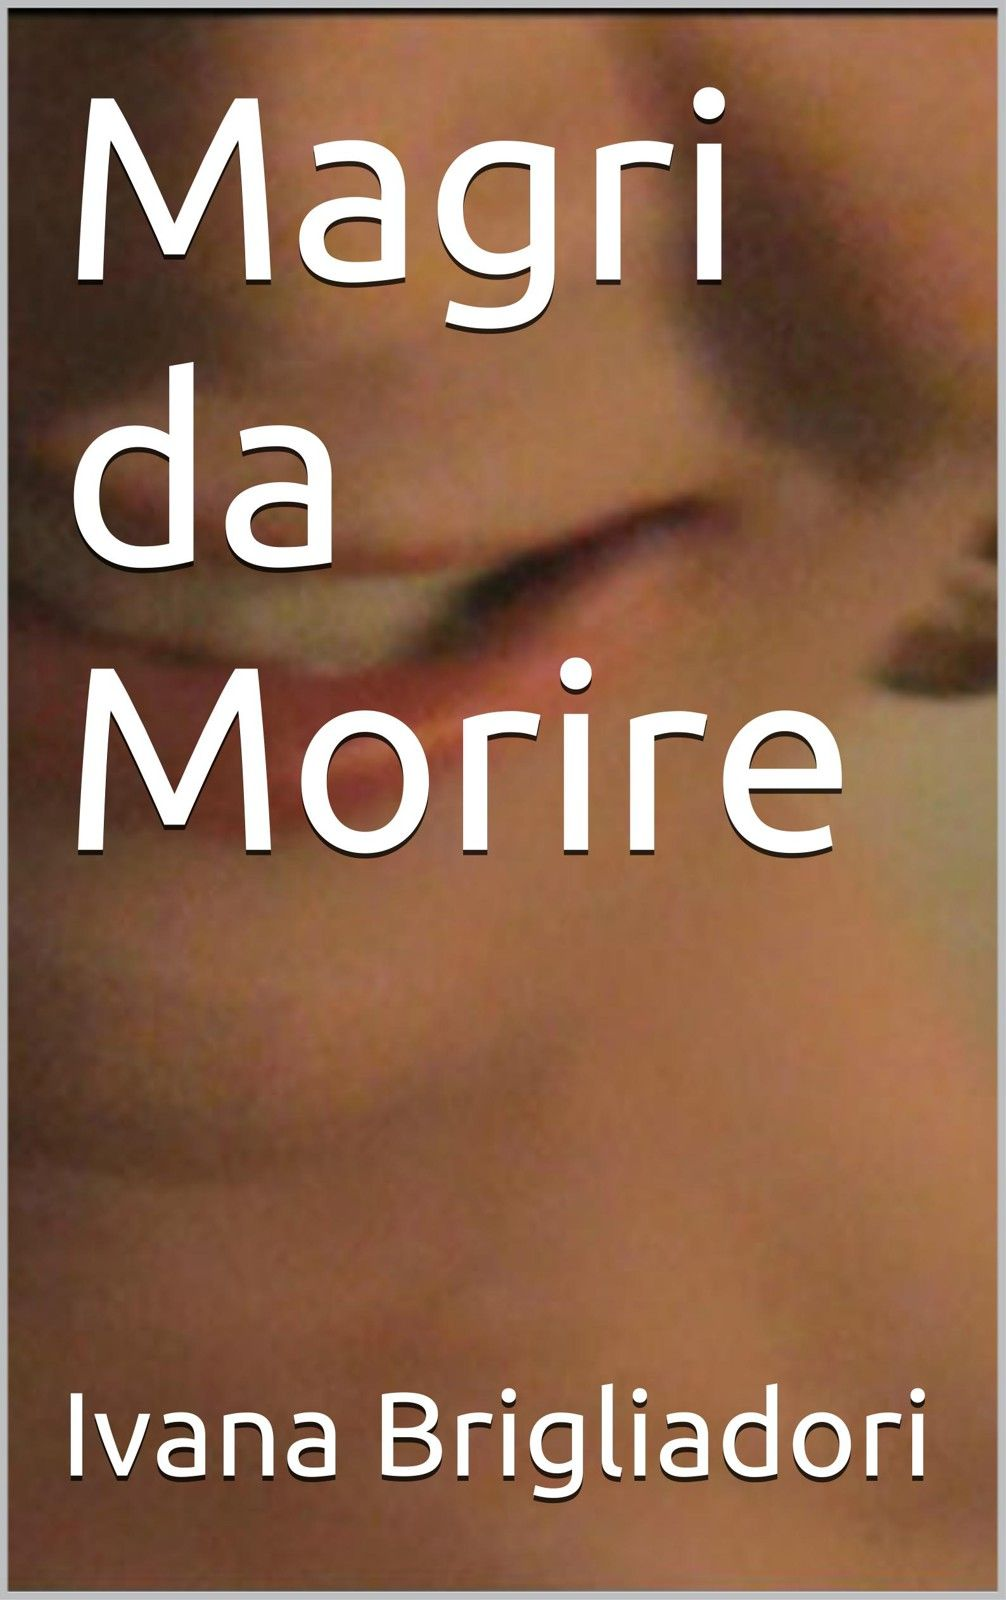 Magri da Morire - Kindle Mobi